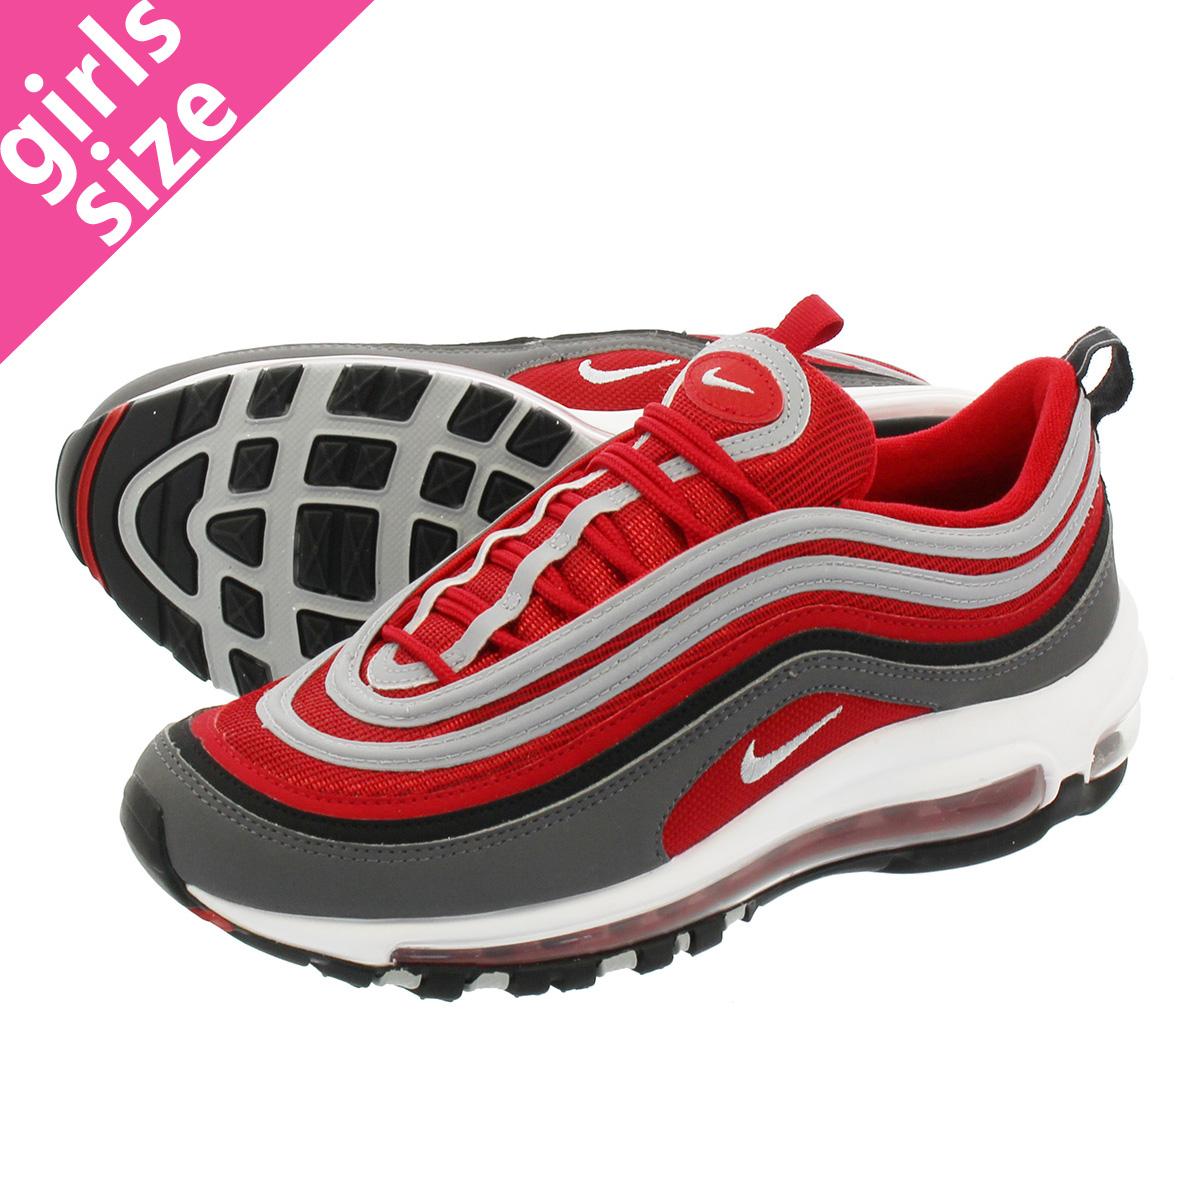 Air Max 97 Dark Grey Gym Red White Nike